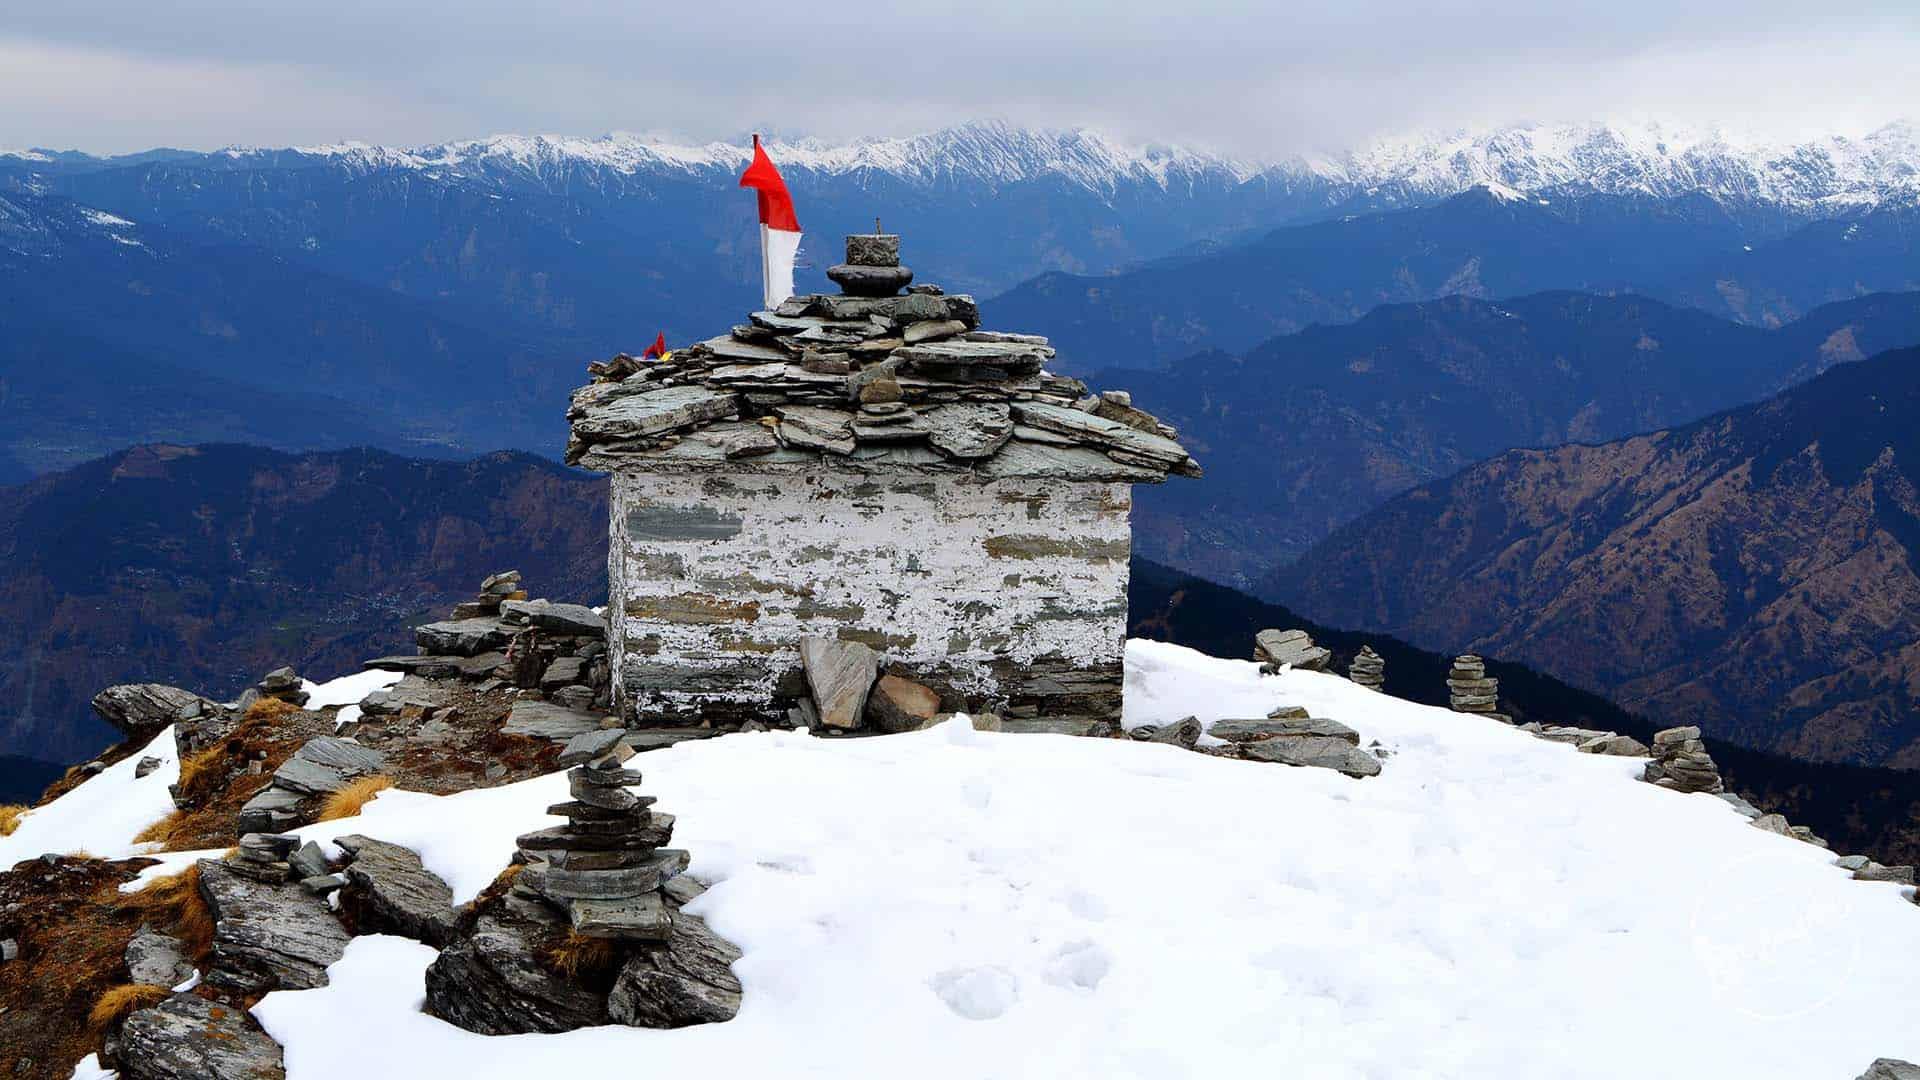 Chandershila Trekking - Chandershila Peak Top